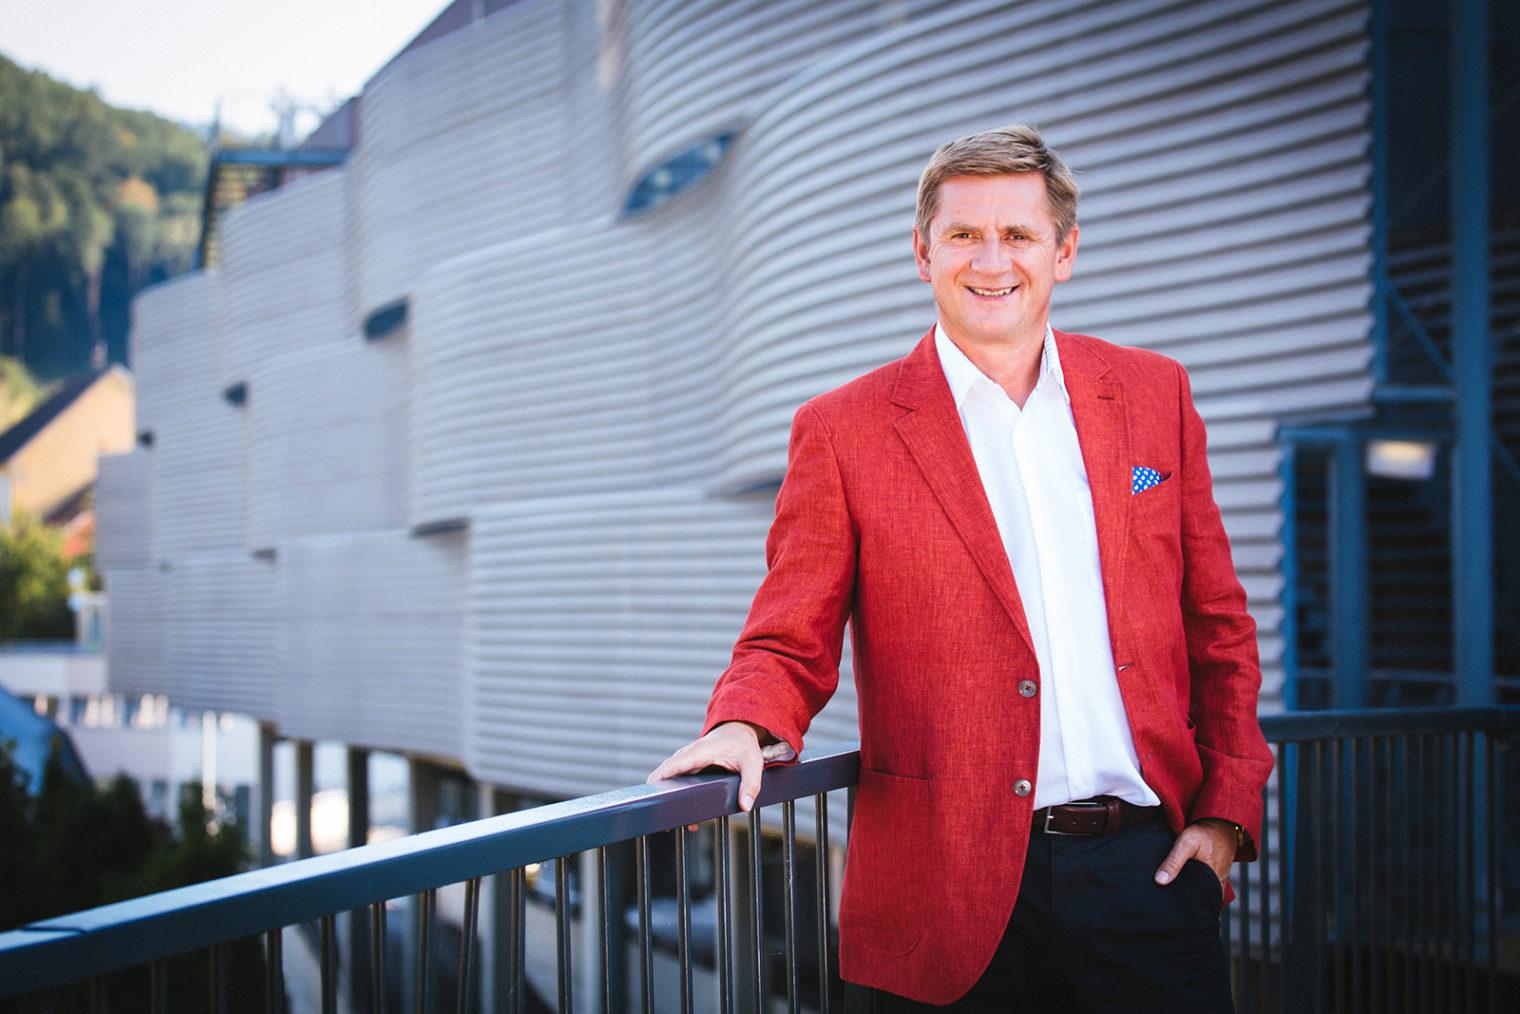 Bürgermeister Kurt Wallner vor der Montanuniversität Leoben